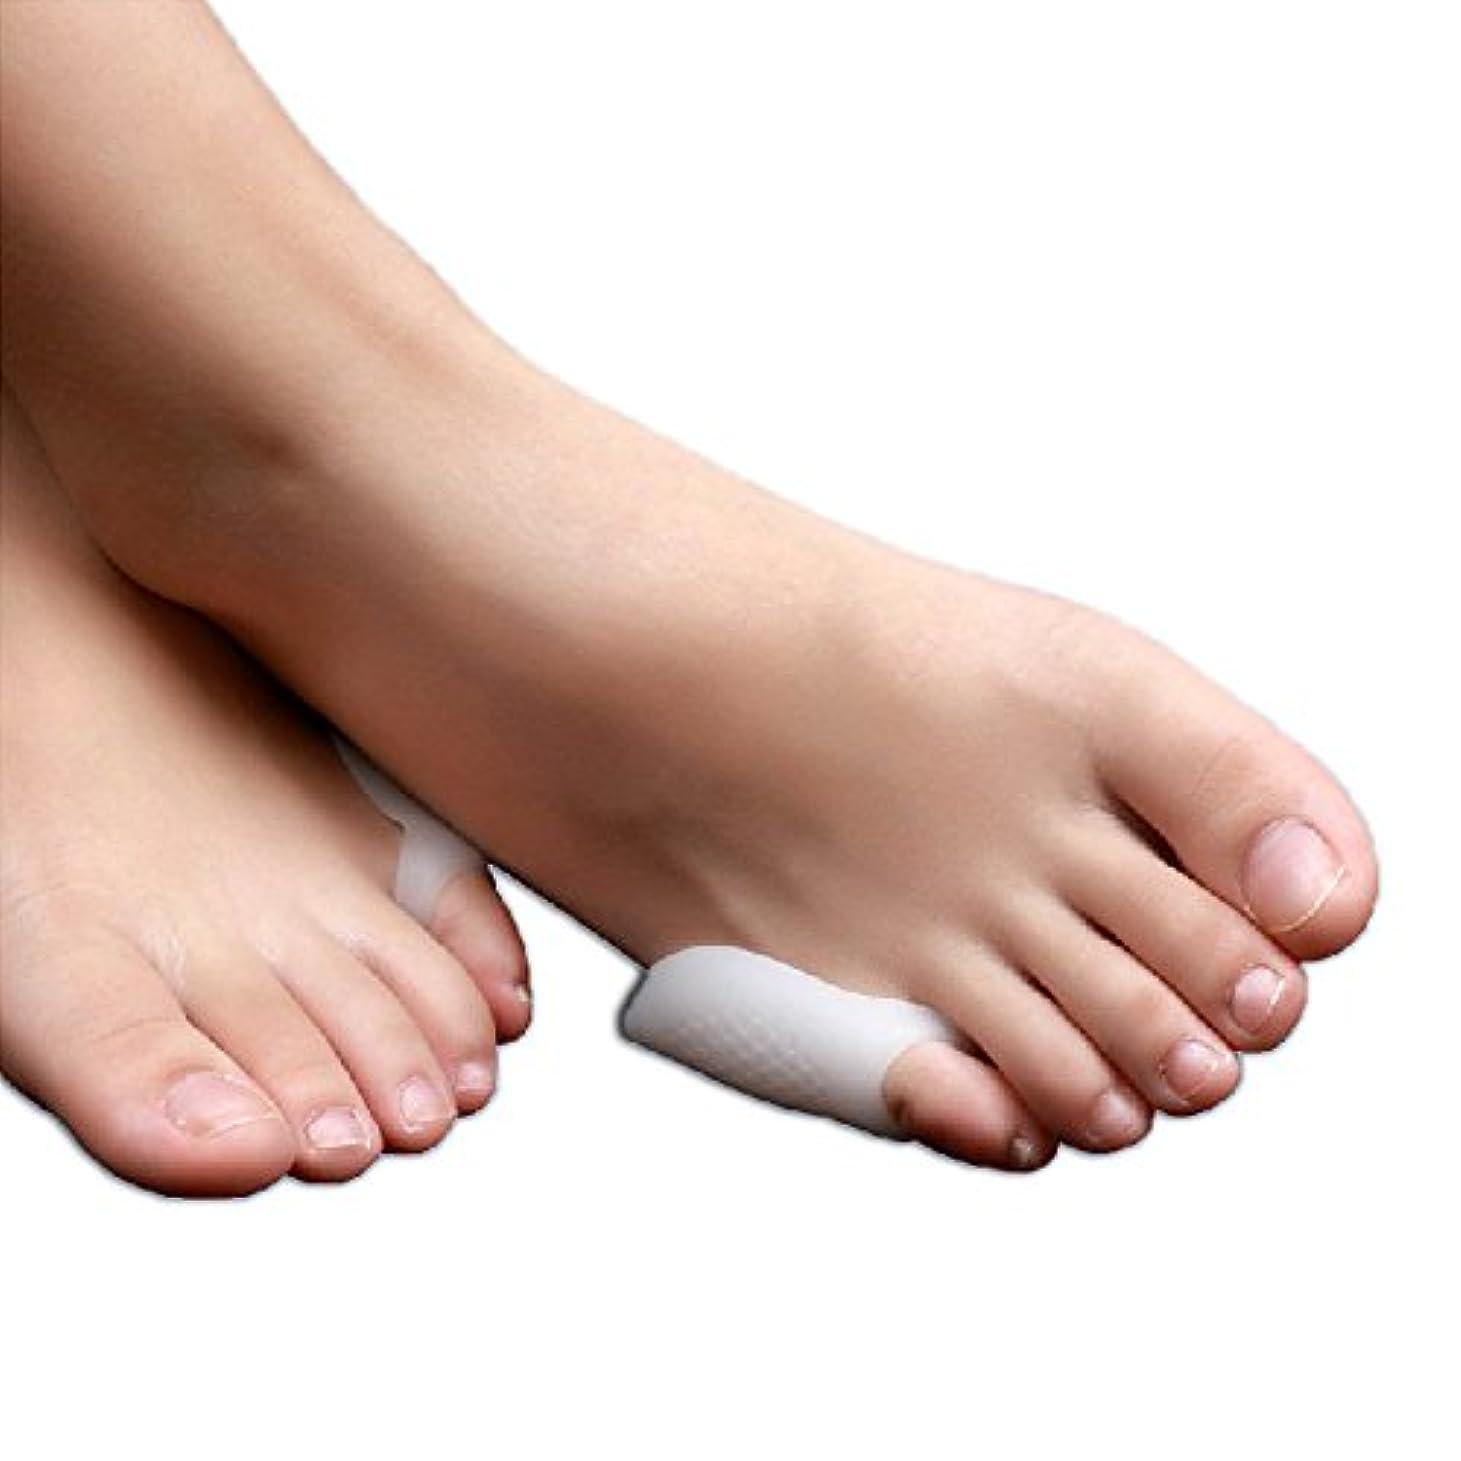 KONMEI 内反小趾 小指の痛みに シリコン素材 優しくガード 2個入り